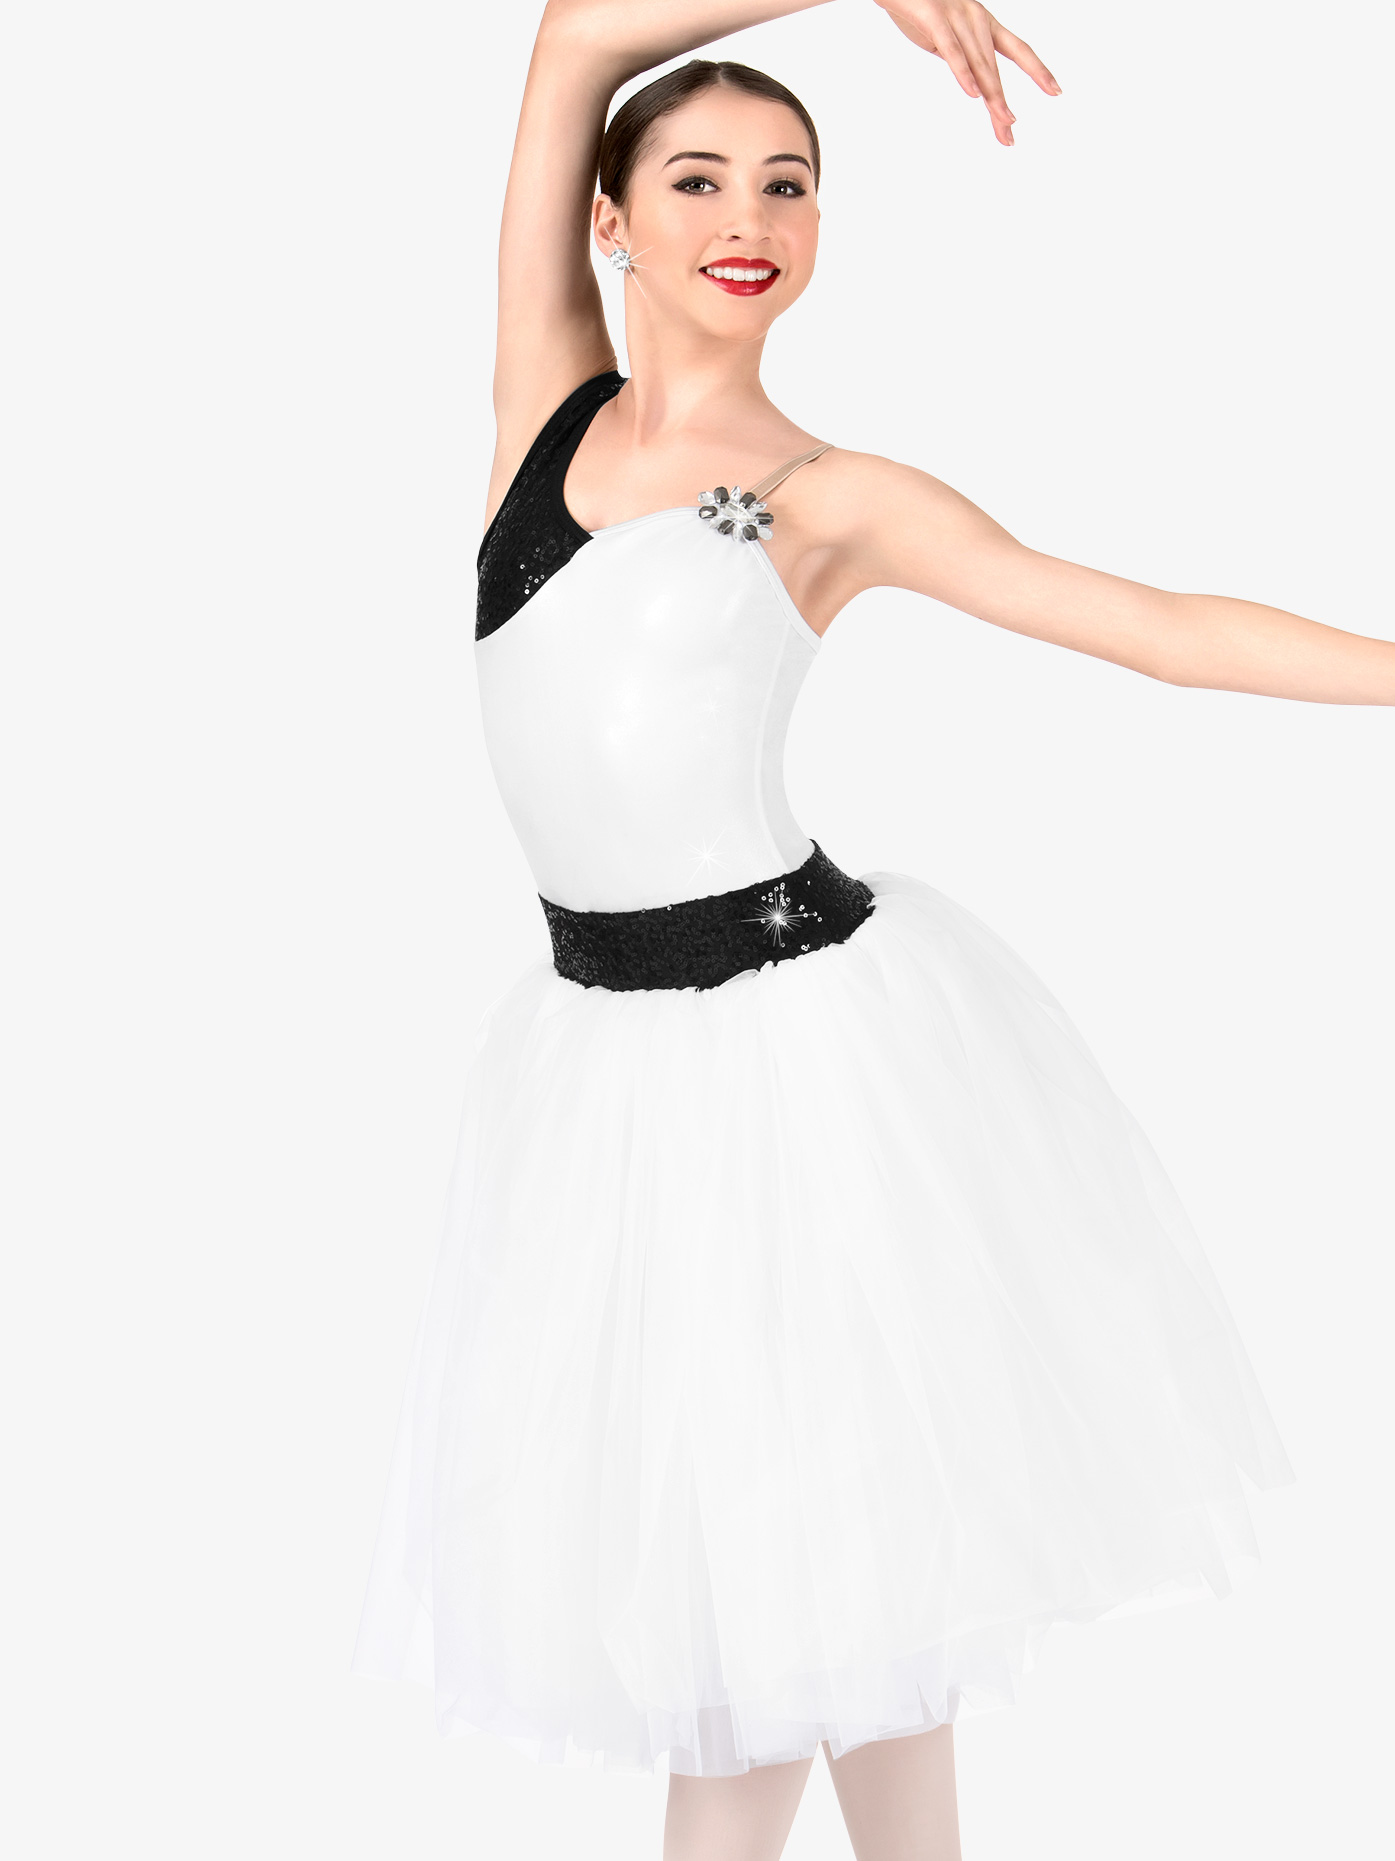 Elisse by Double Platinum Womens One Shoulder Romantic Tutu Costume Dress N7464